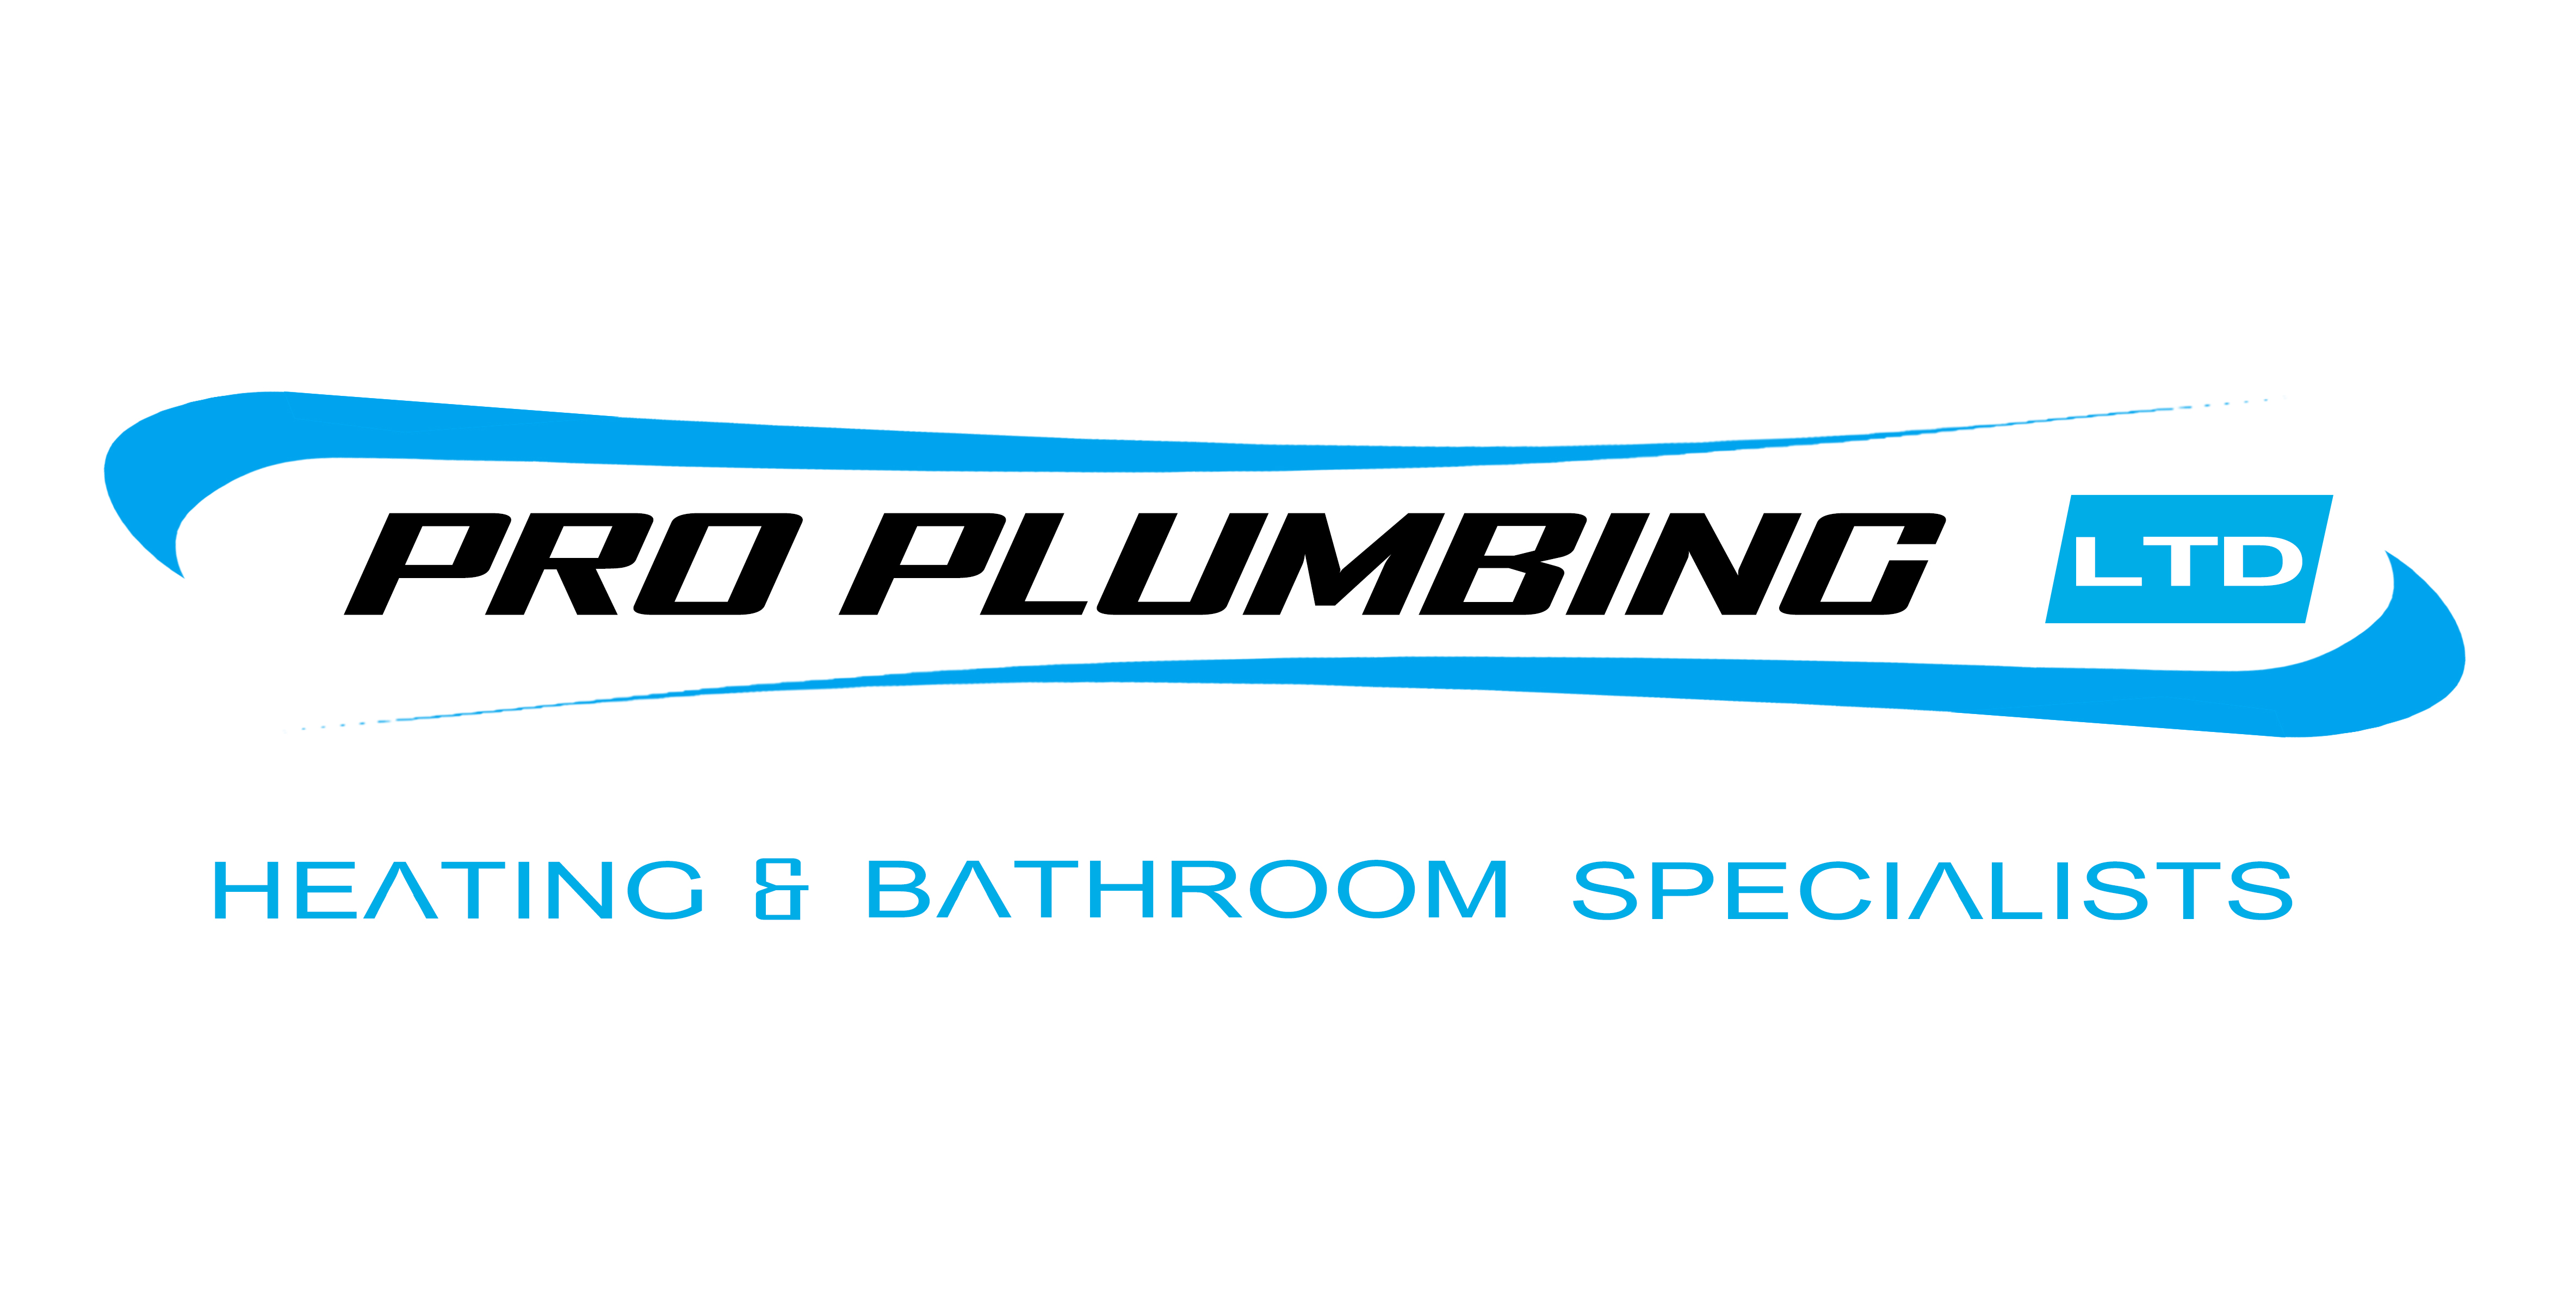 Pro Plumbing Ltd Logo